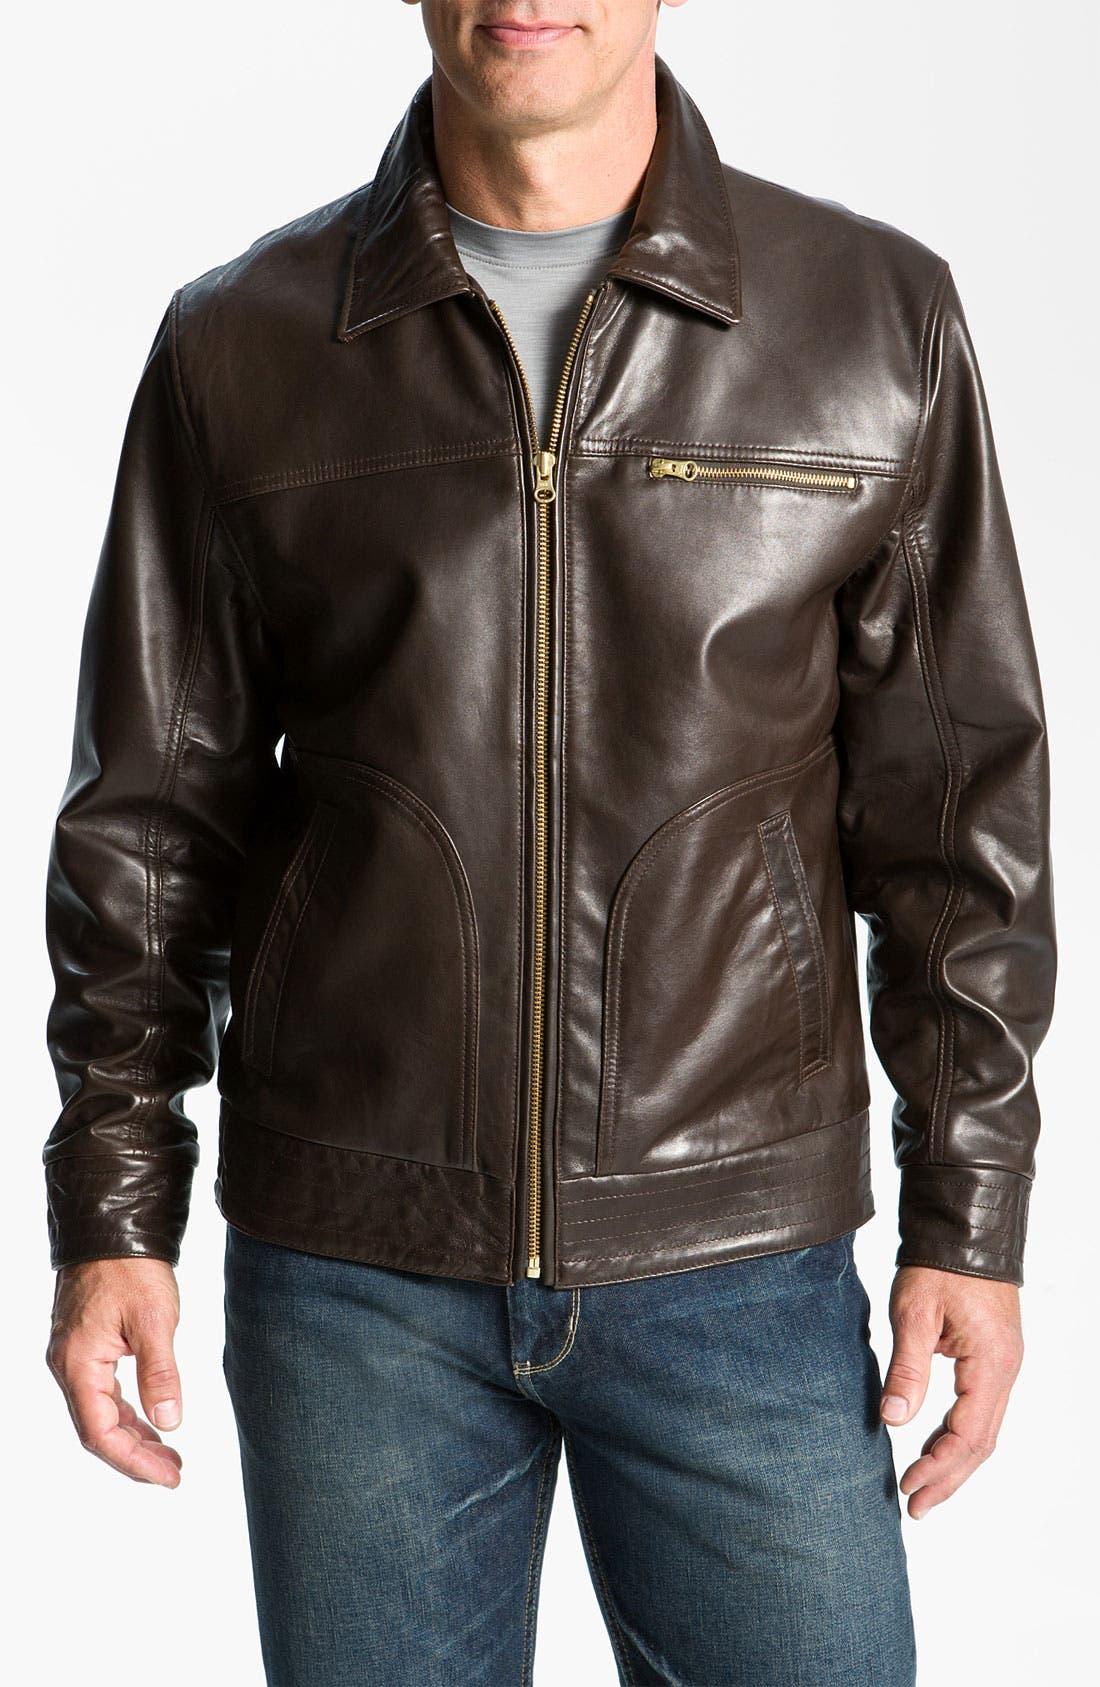 Alternate Image 1 Selected - Cutter & Buck 'Wildridge' Leather Bomber Jacket (Big & Tall)